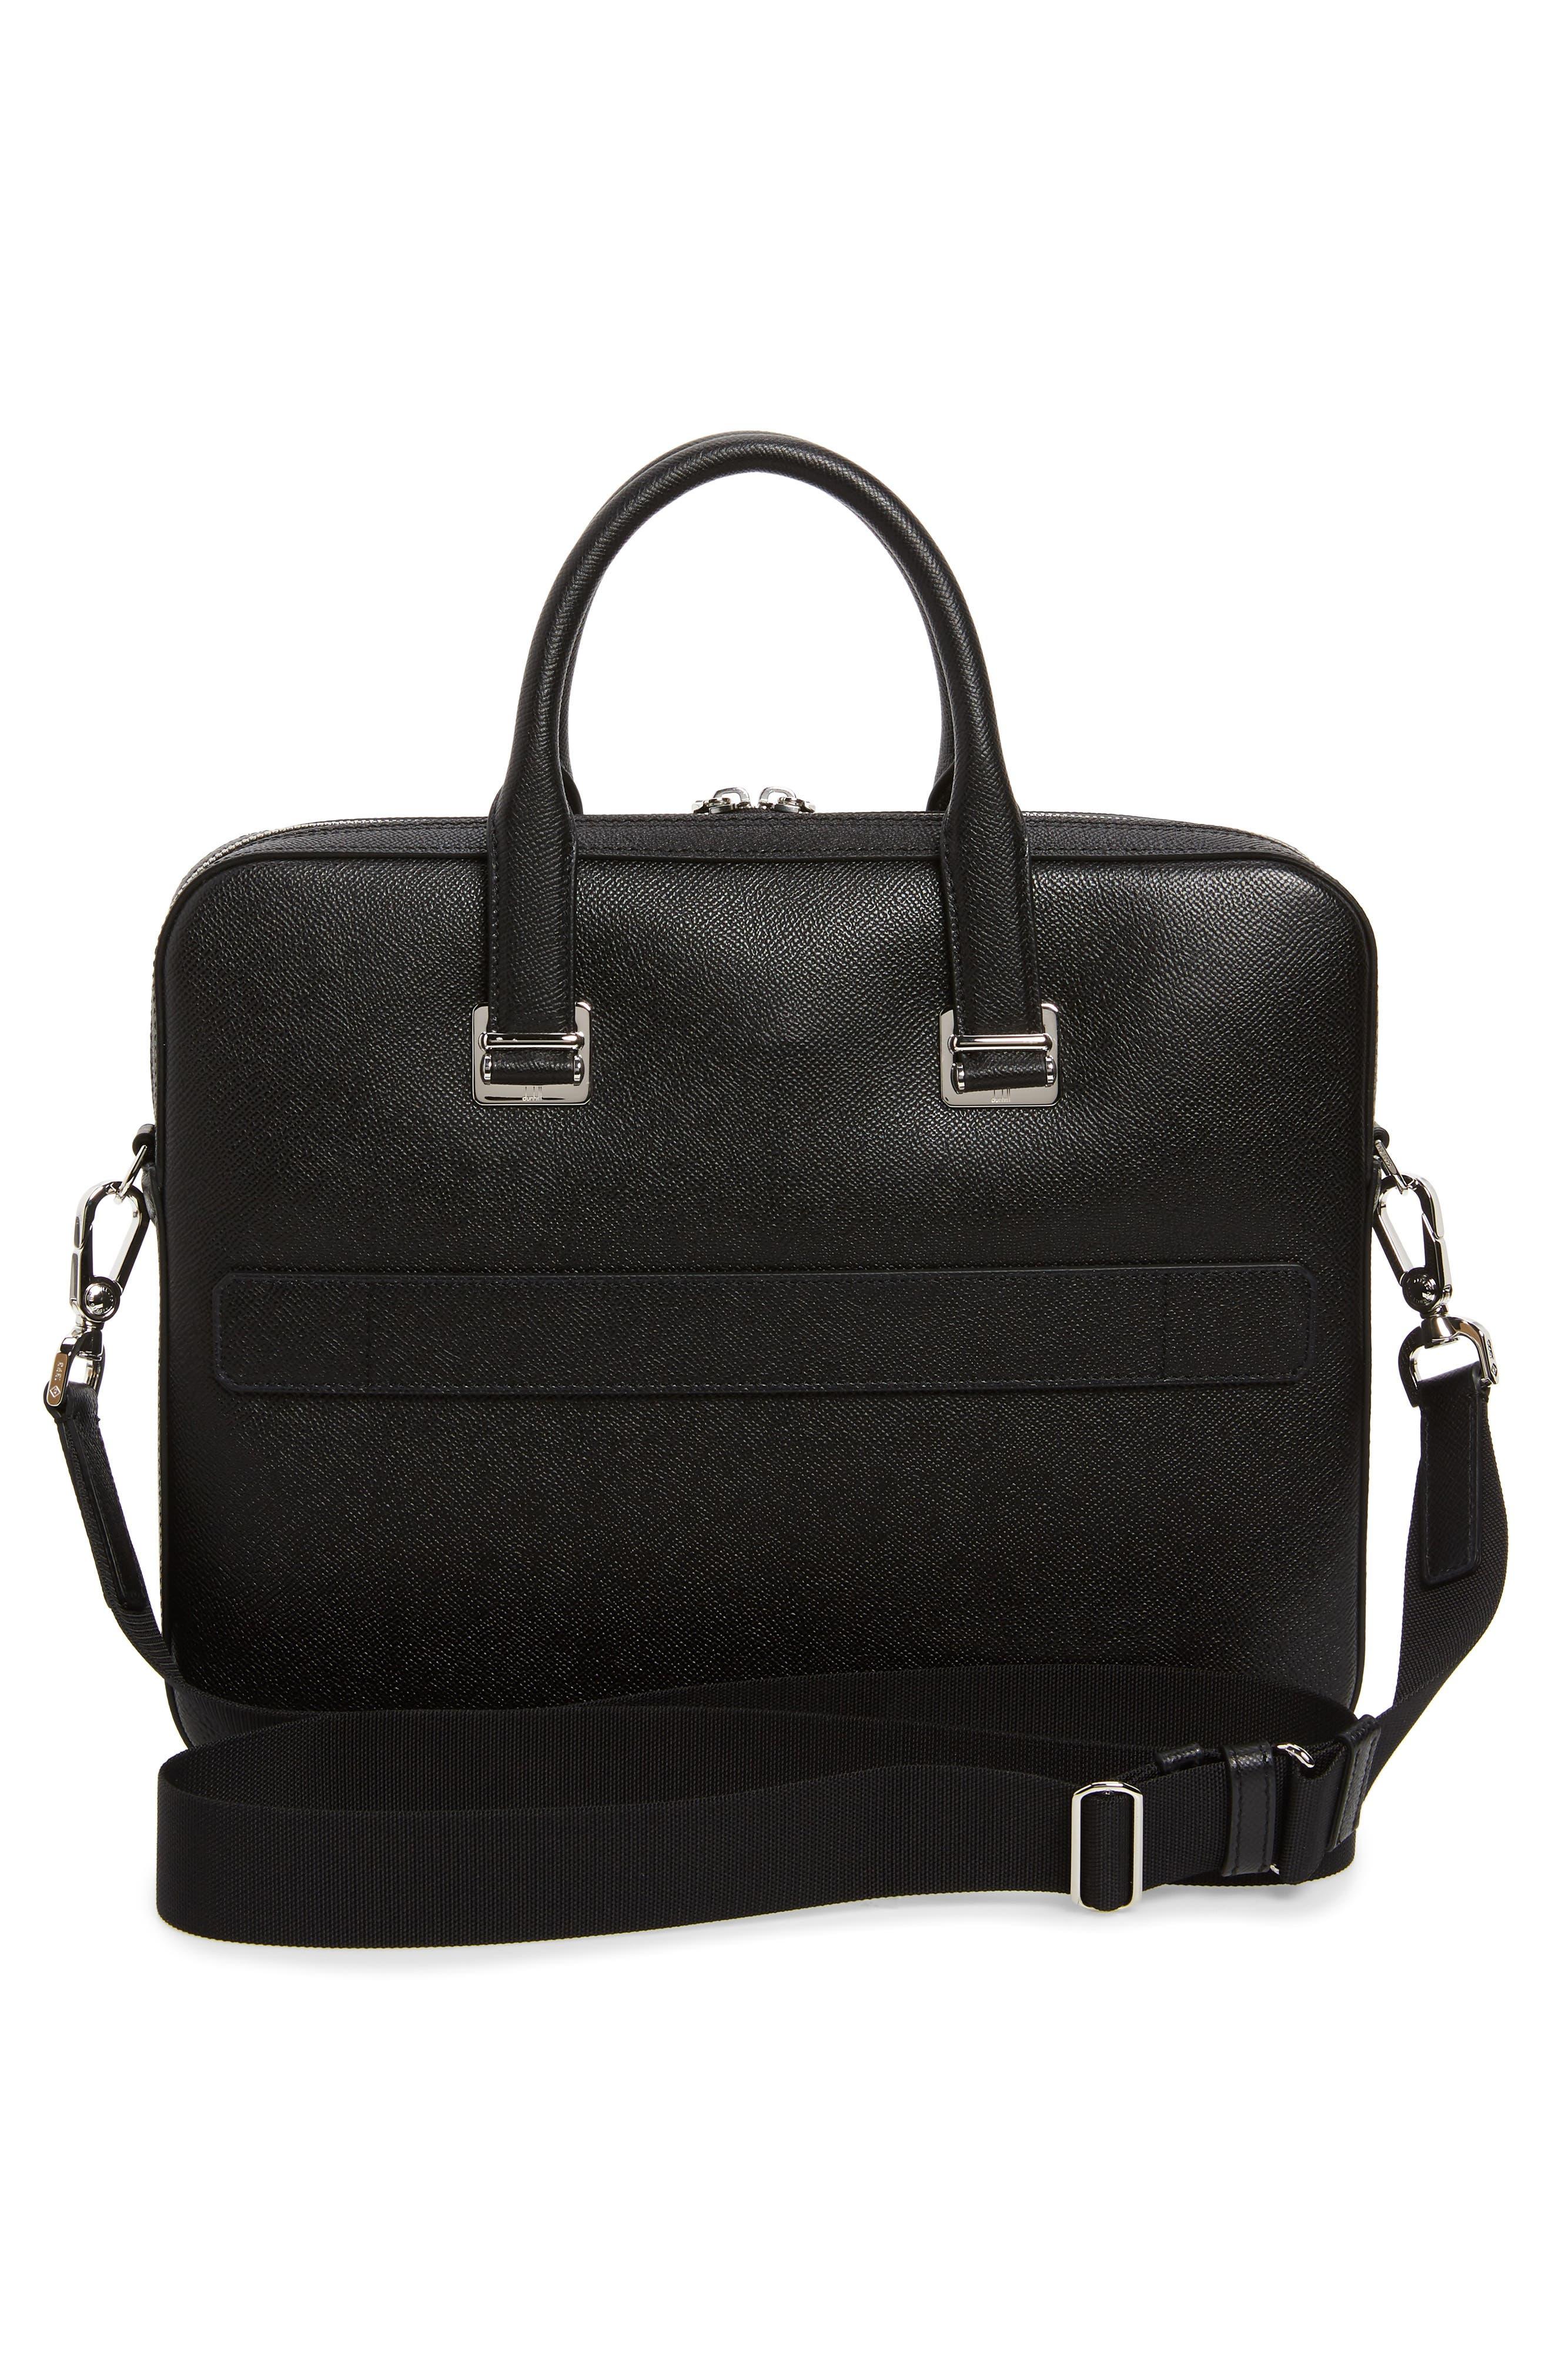 DUNHILL, Cadogan Leather Single Document Case, Alternate thumbnail 3, color, BLACK